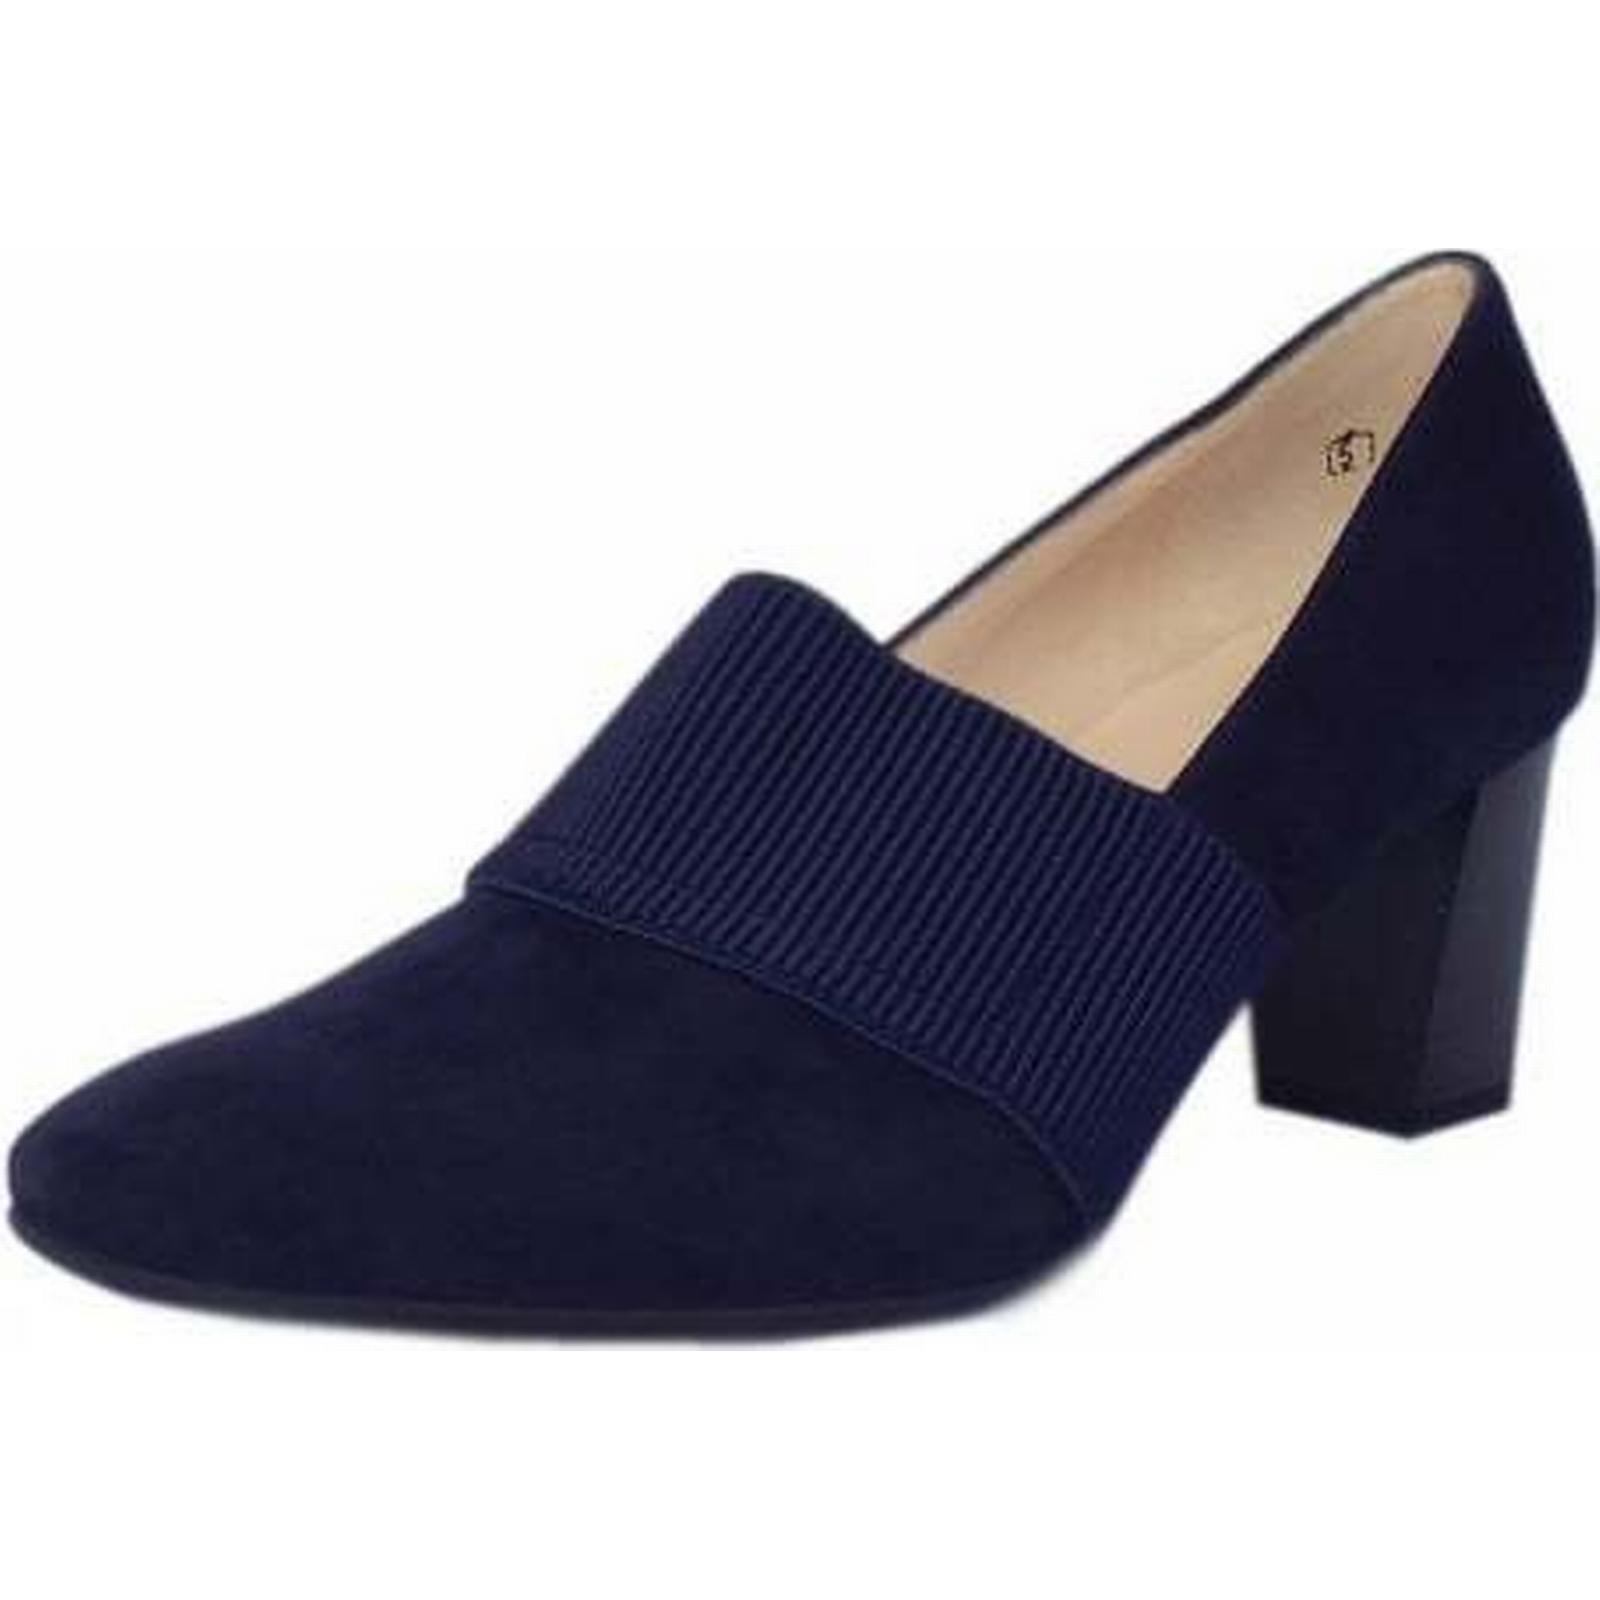 peter kaiser dorna mesdames peter kaiser mesdames dorna chaussures taille: 7, couleur: notte su 662e05